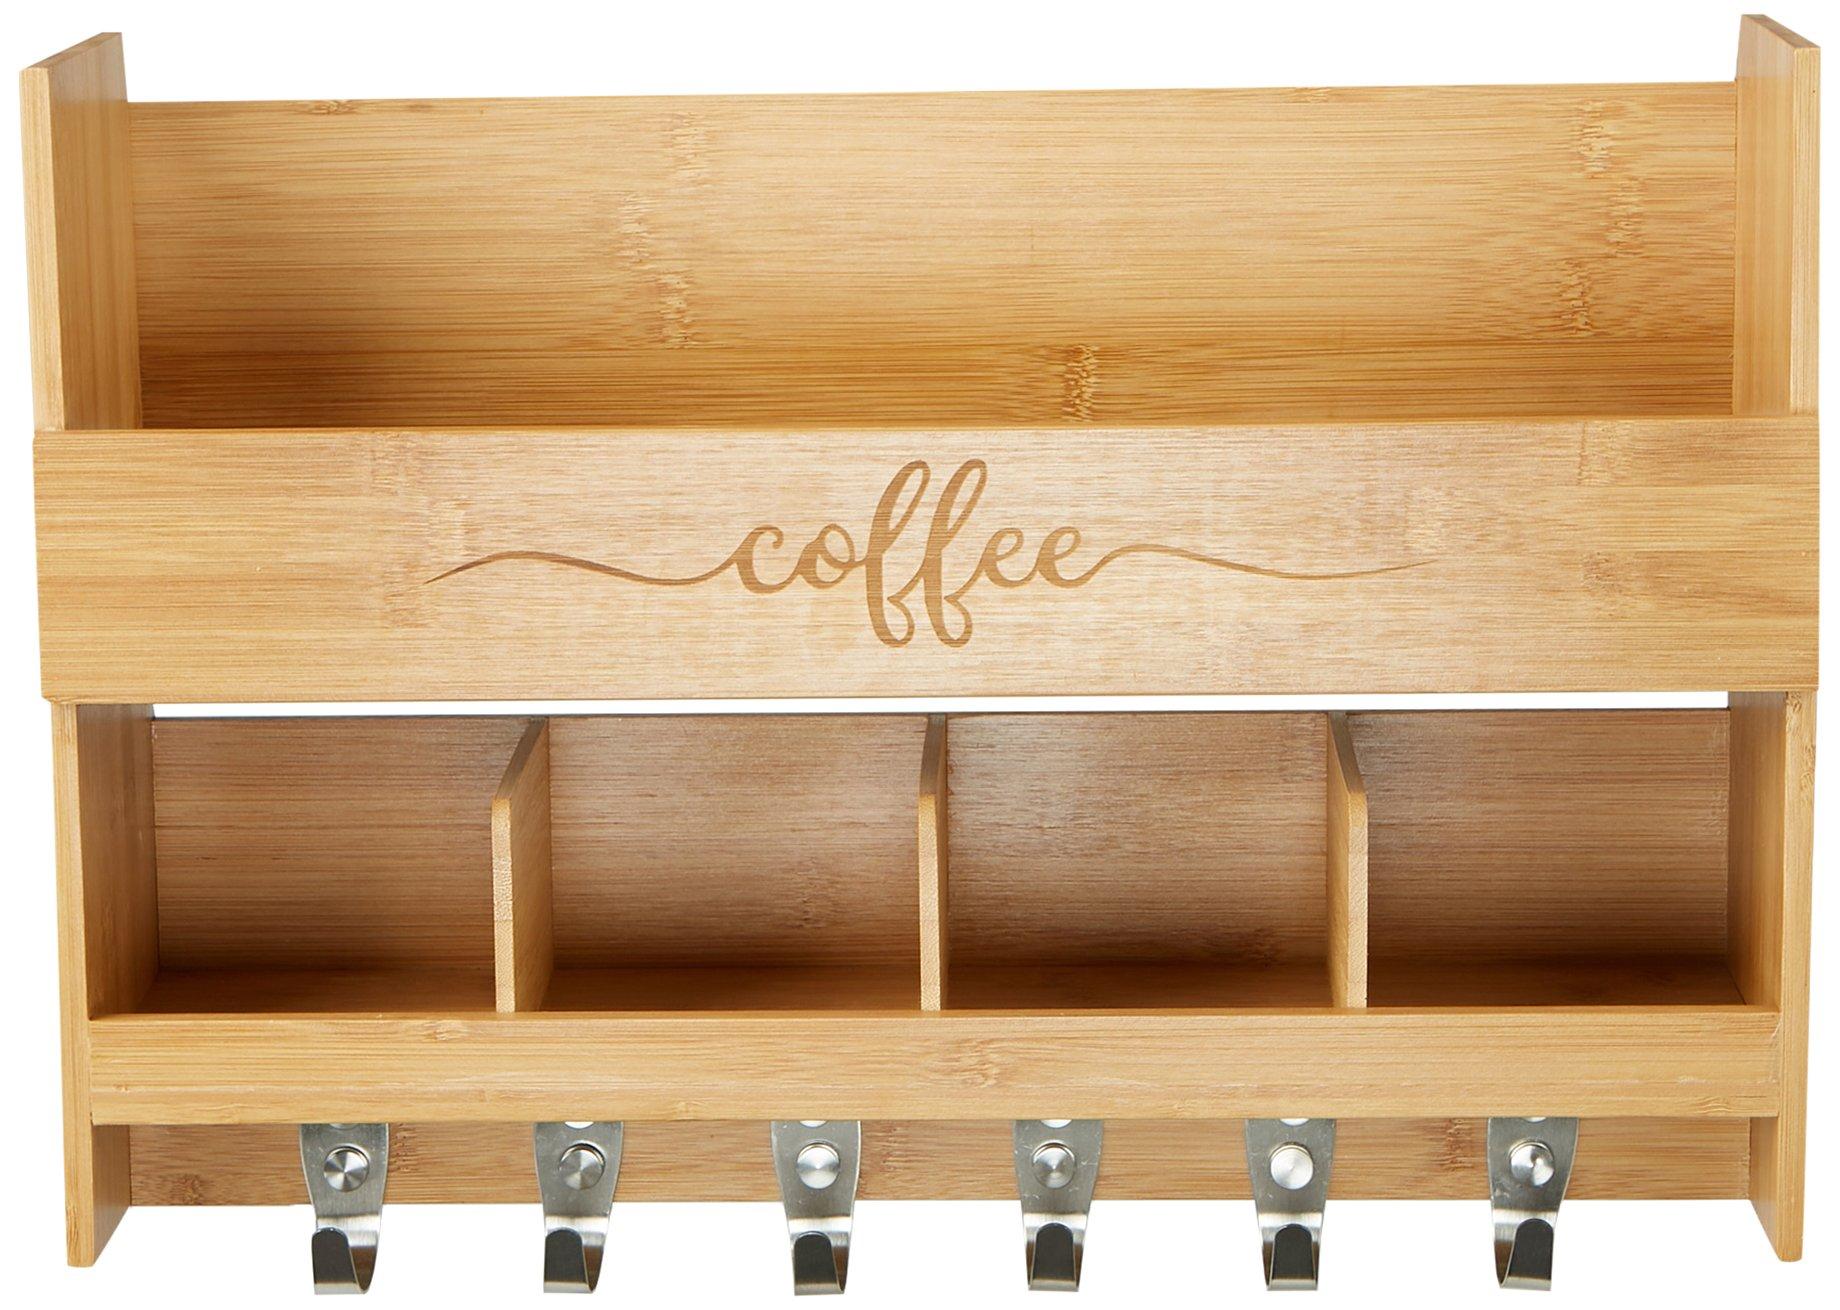 Mind Reader Wall Mount Coffee Mug Rack,Kitchen Storage Organizer with 6 Hooks and 2 Shelves, Brown